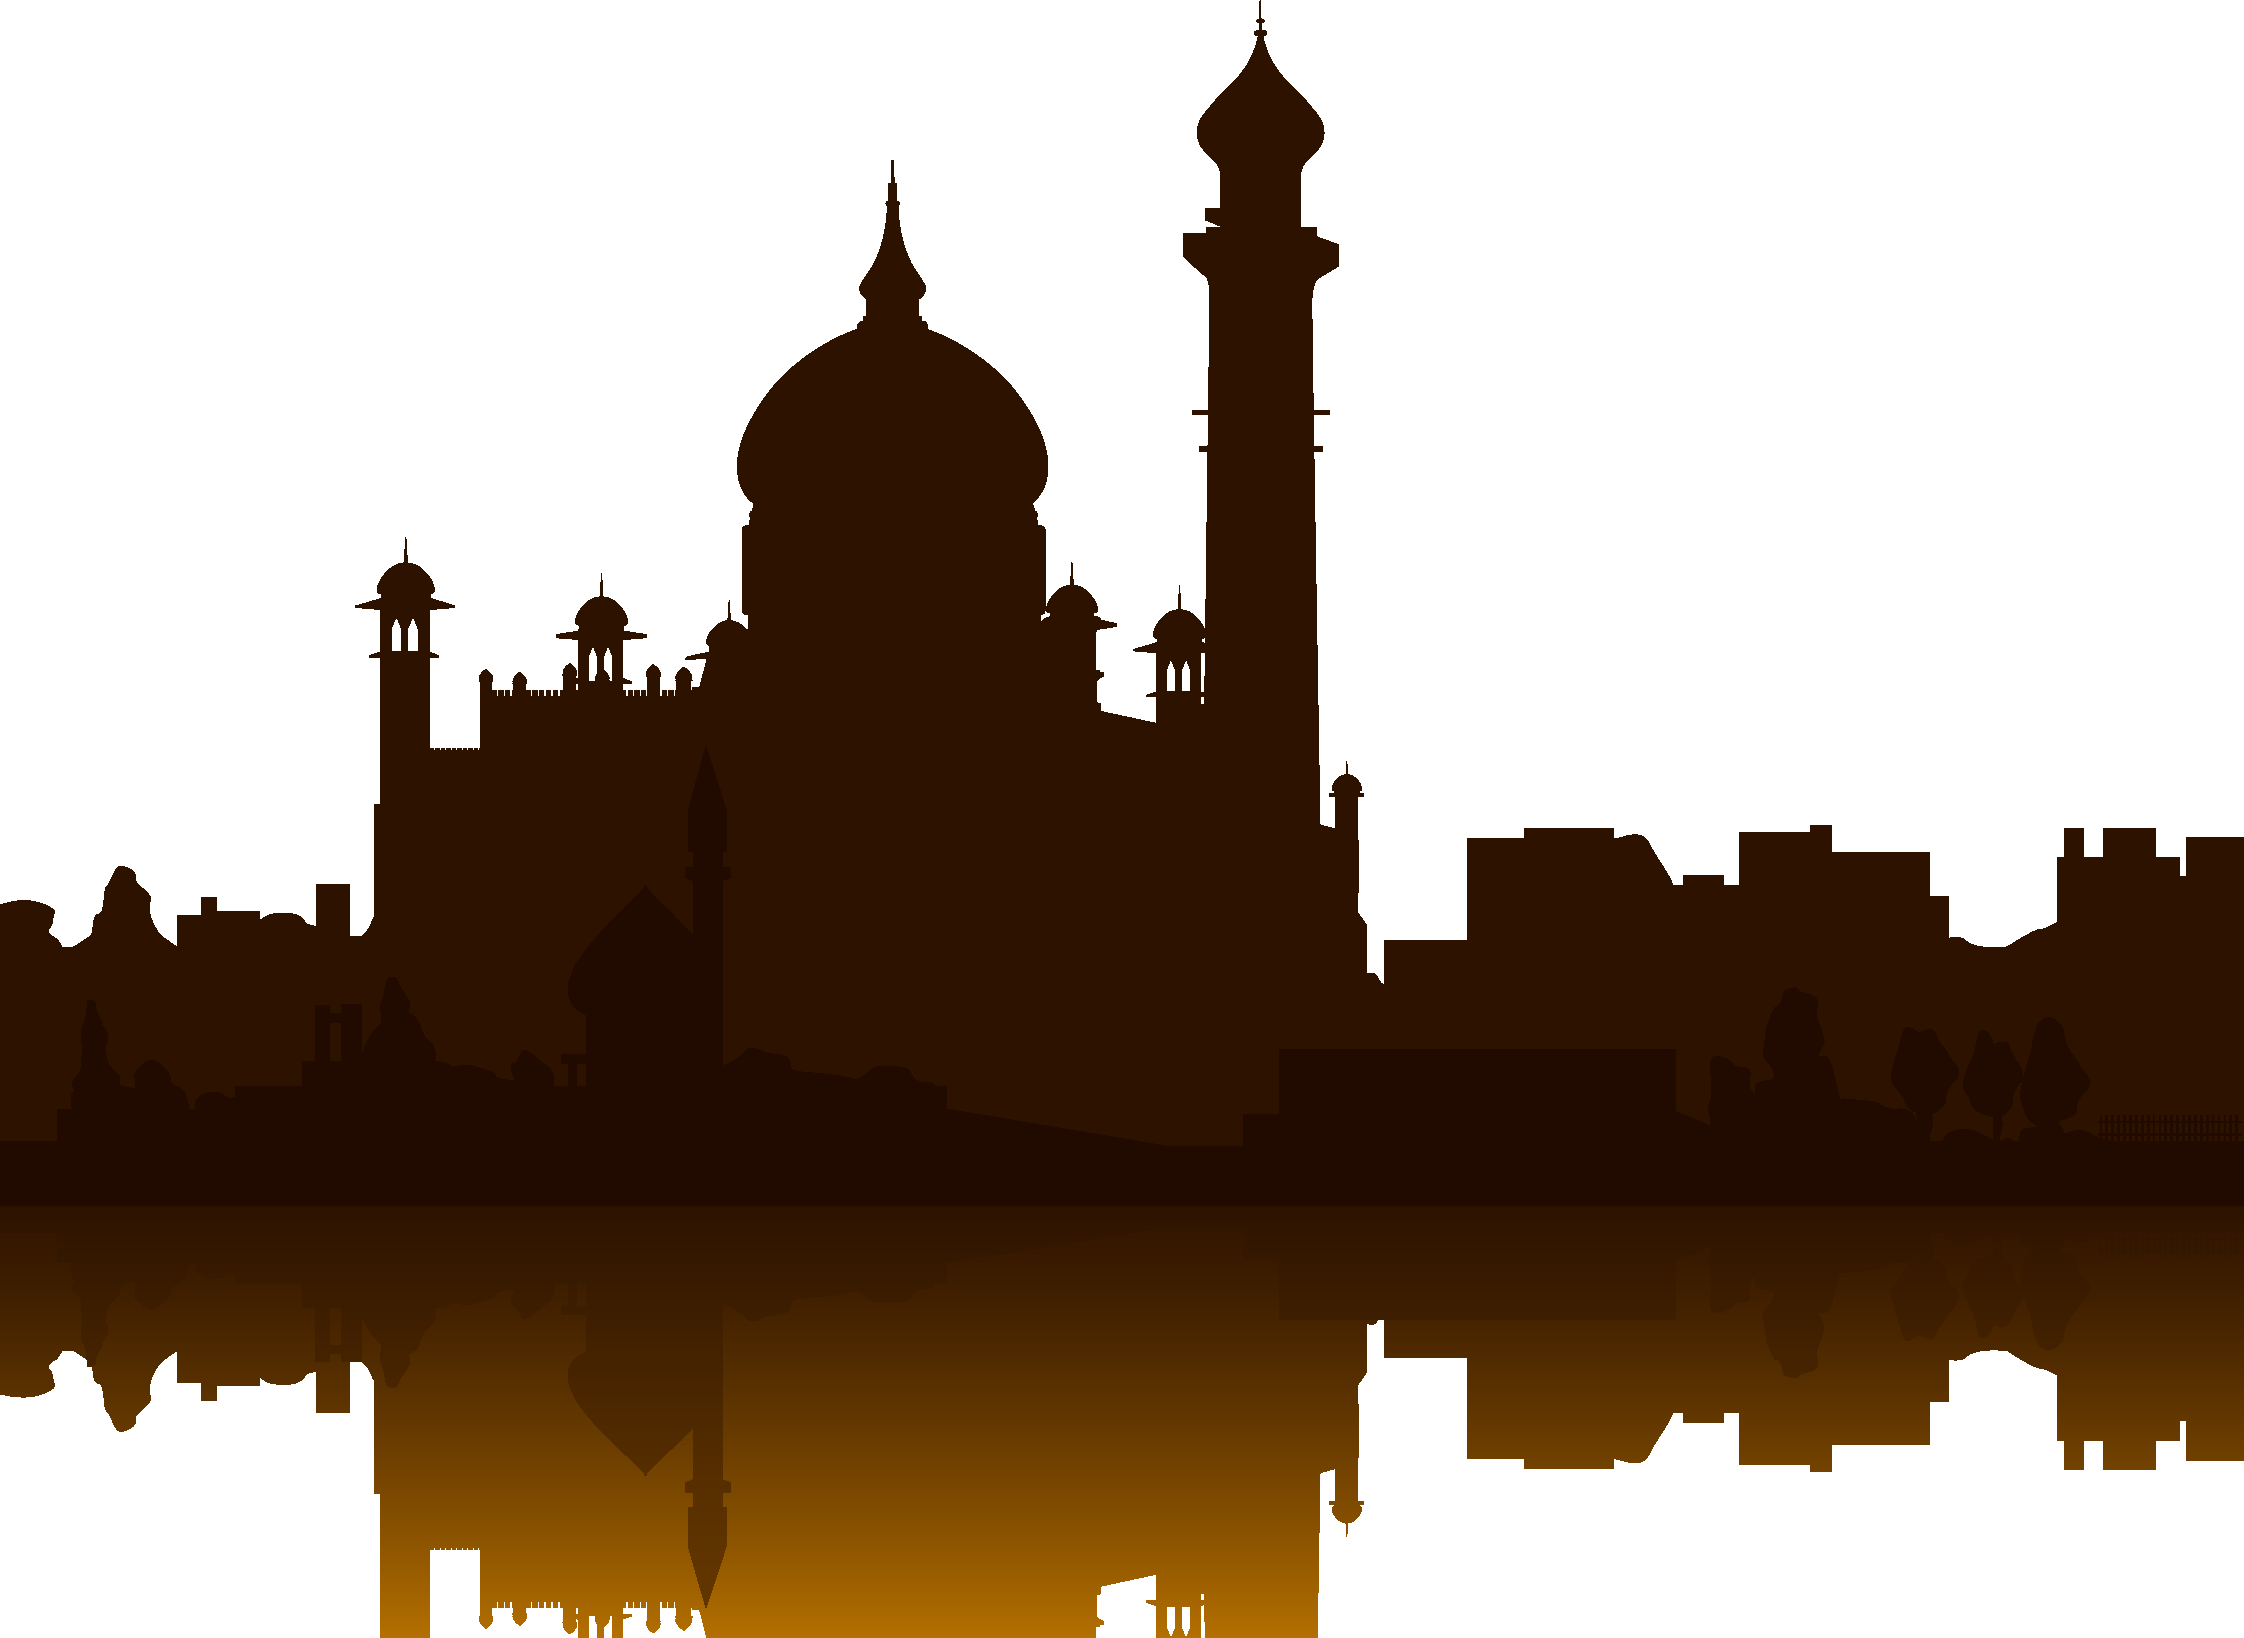 2244x1638 Taj Mahal Building Silhouette